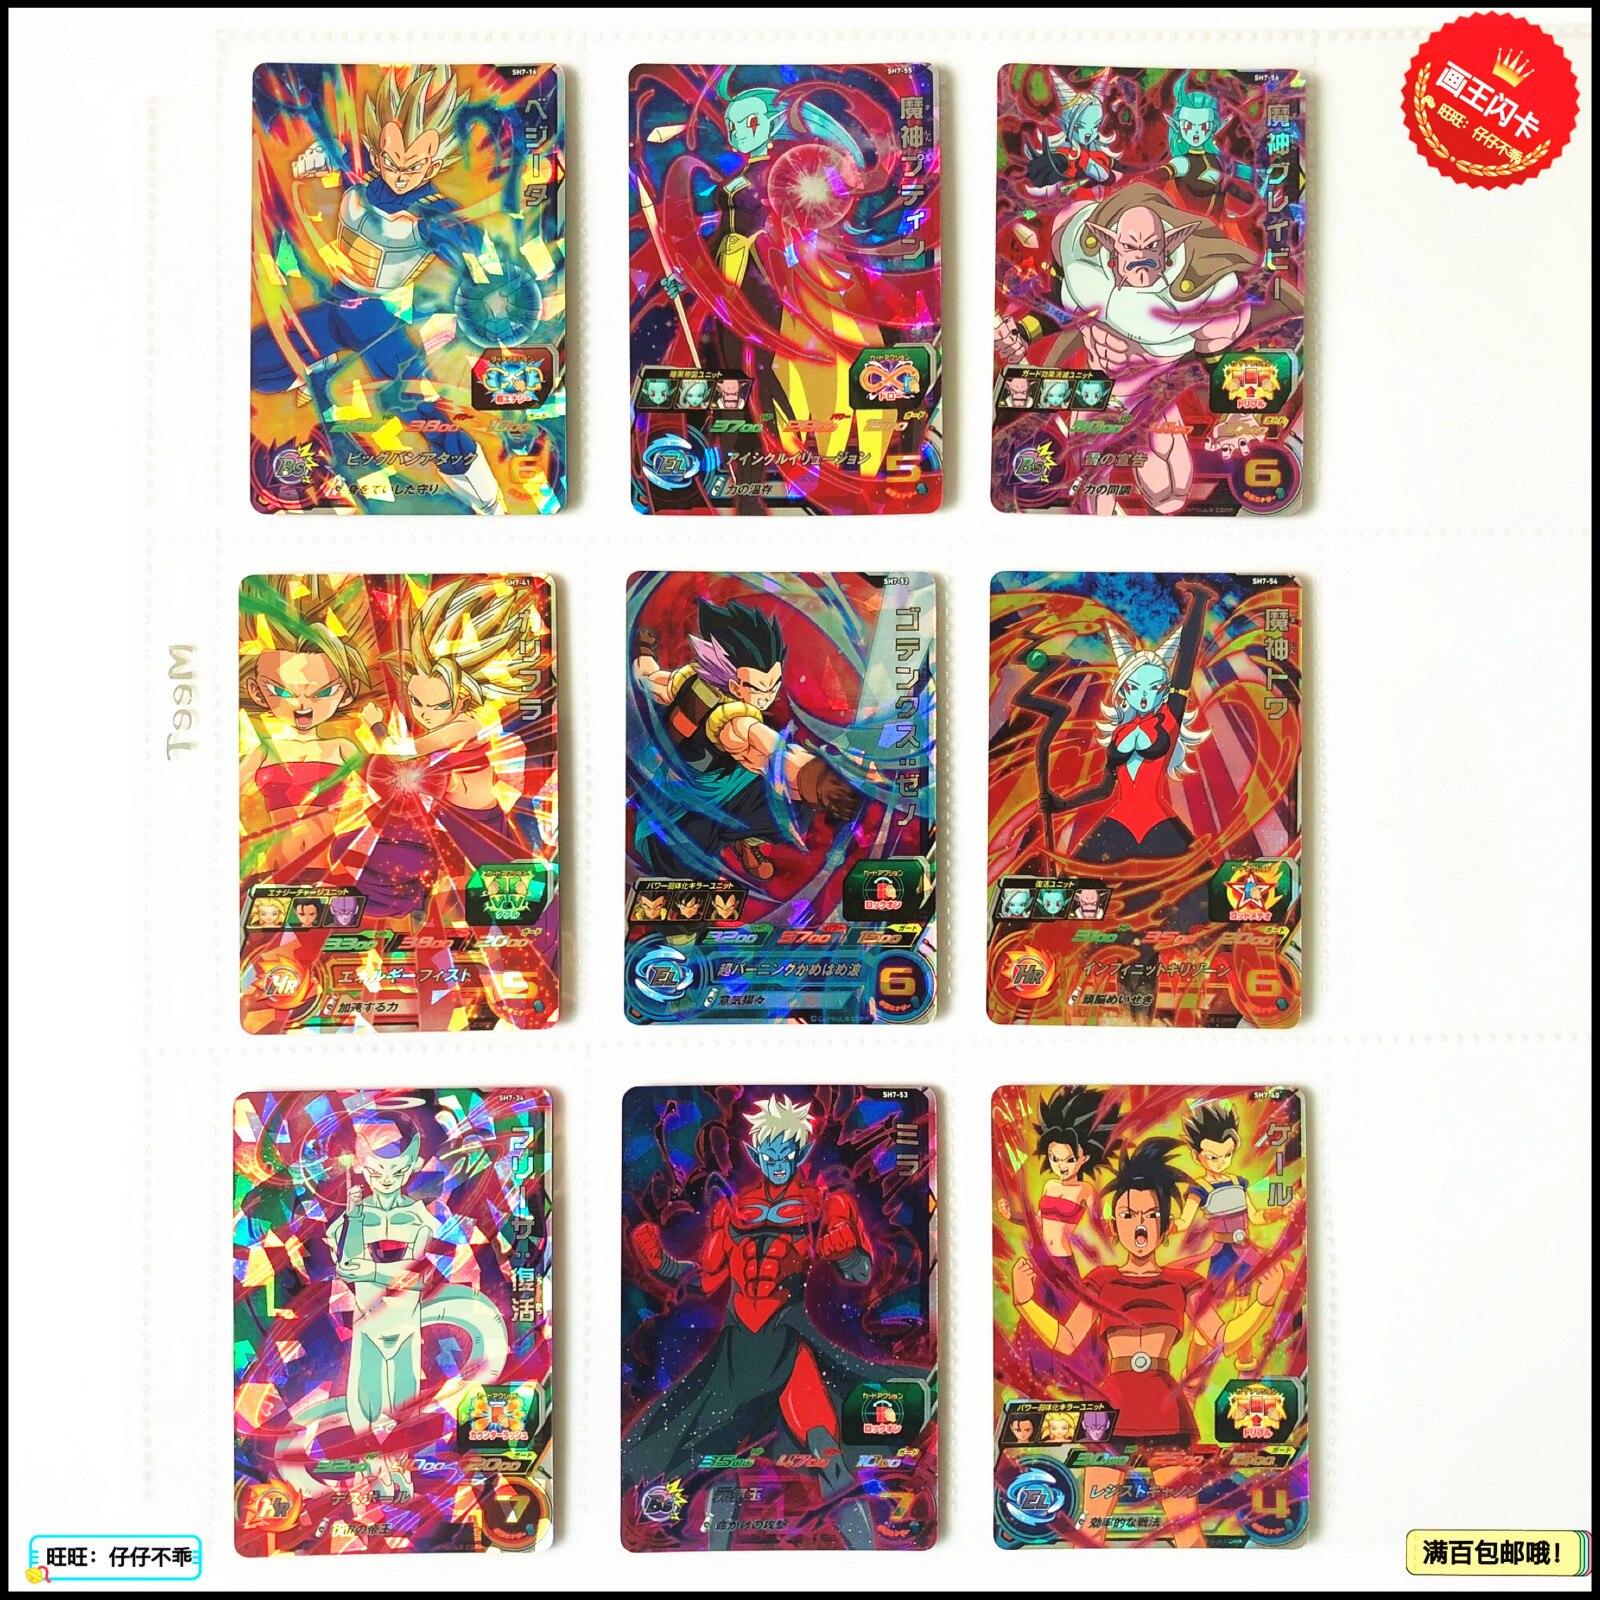 Japan Original Dragon Ball Hero Card SR Flash 3 Stars SH7 Goku Kale Toys Hobbies Collectibles Game Collection Anime Cards